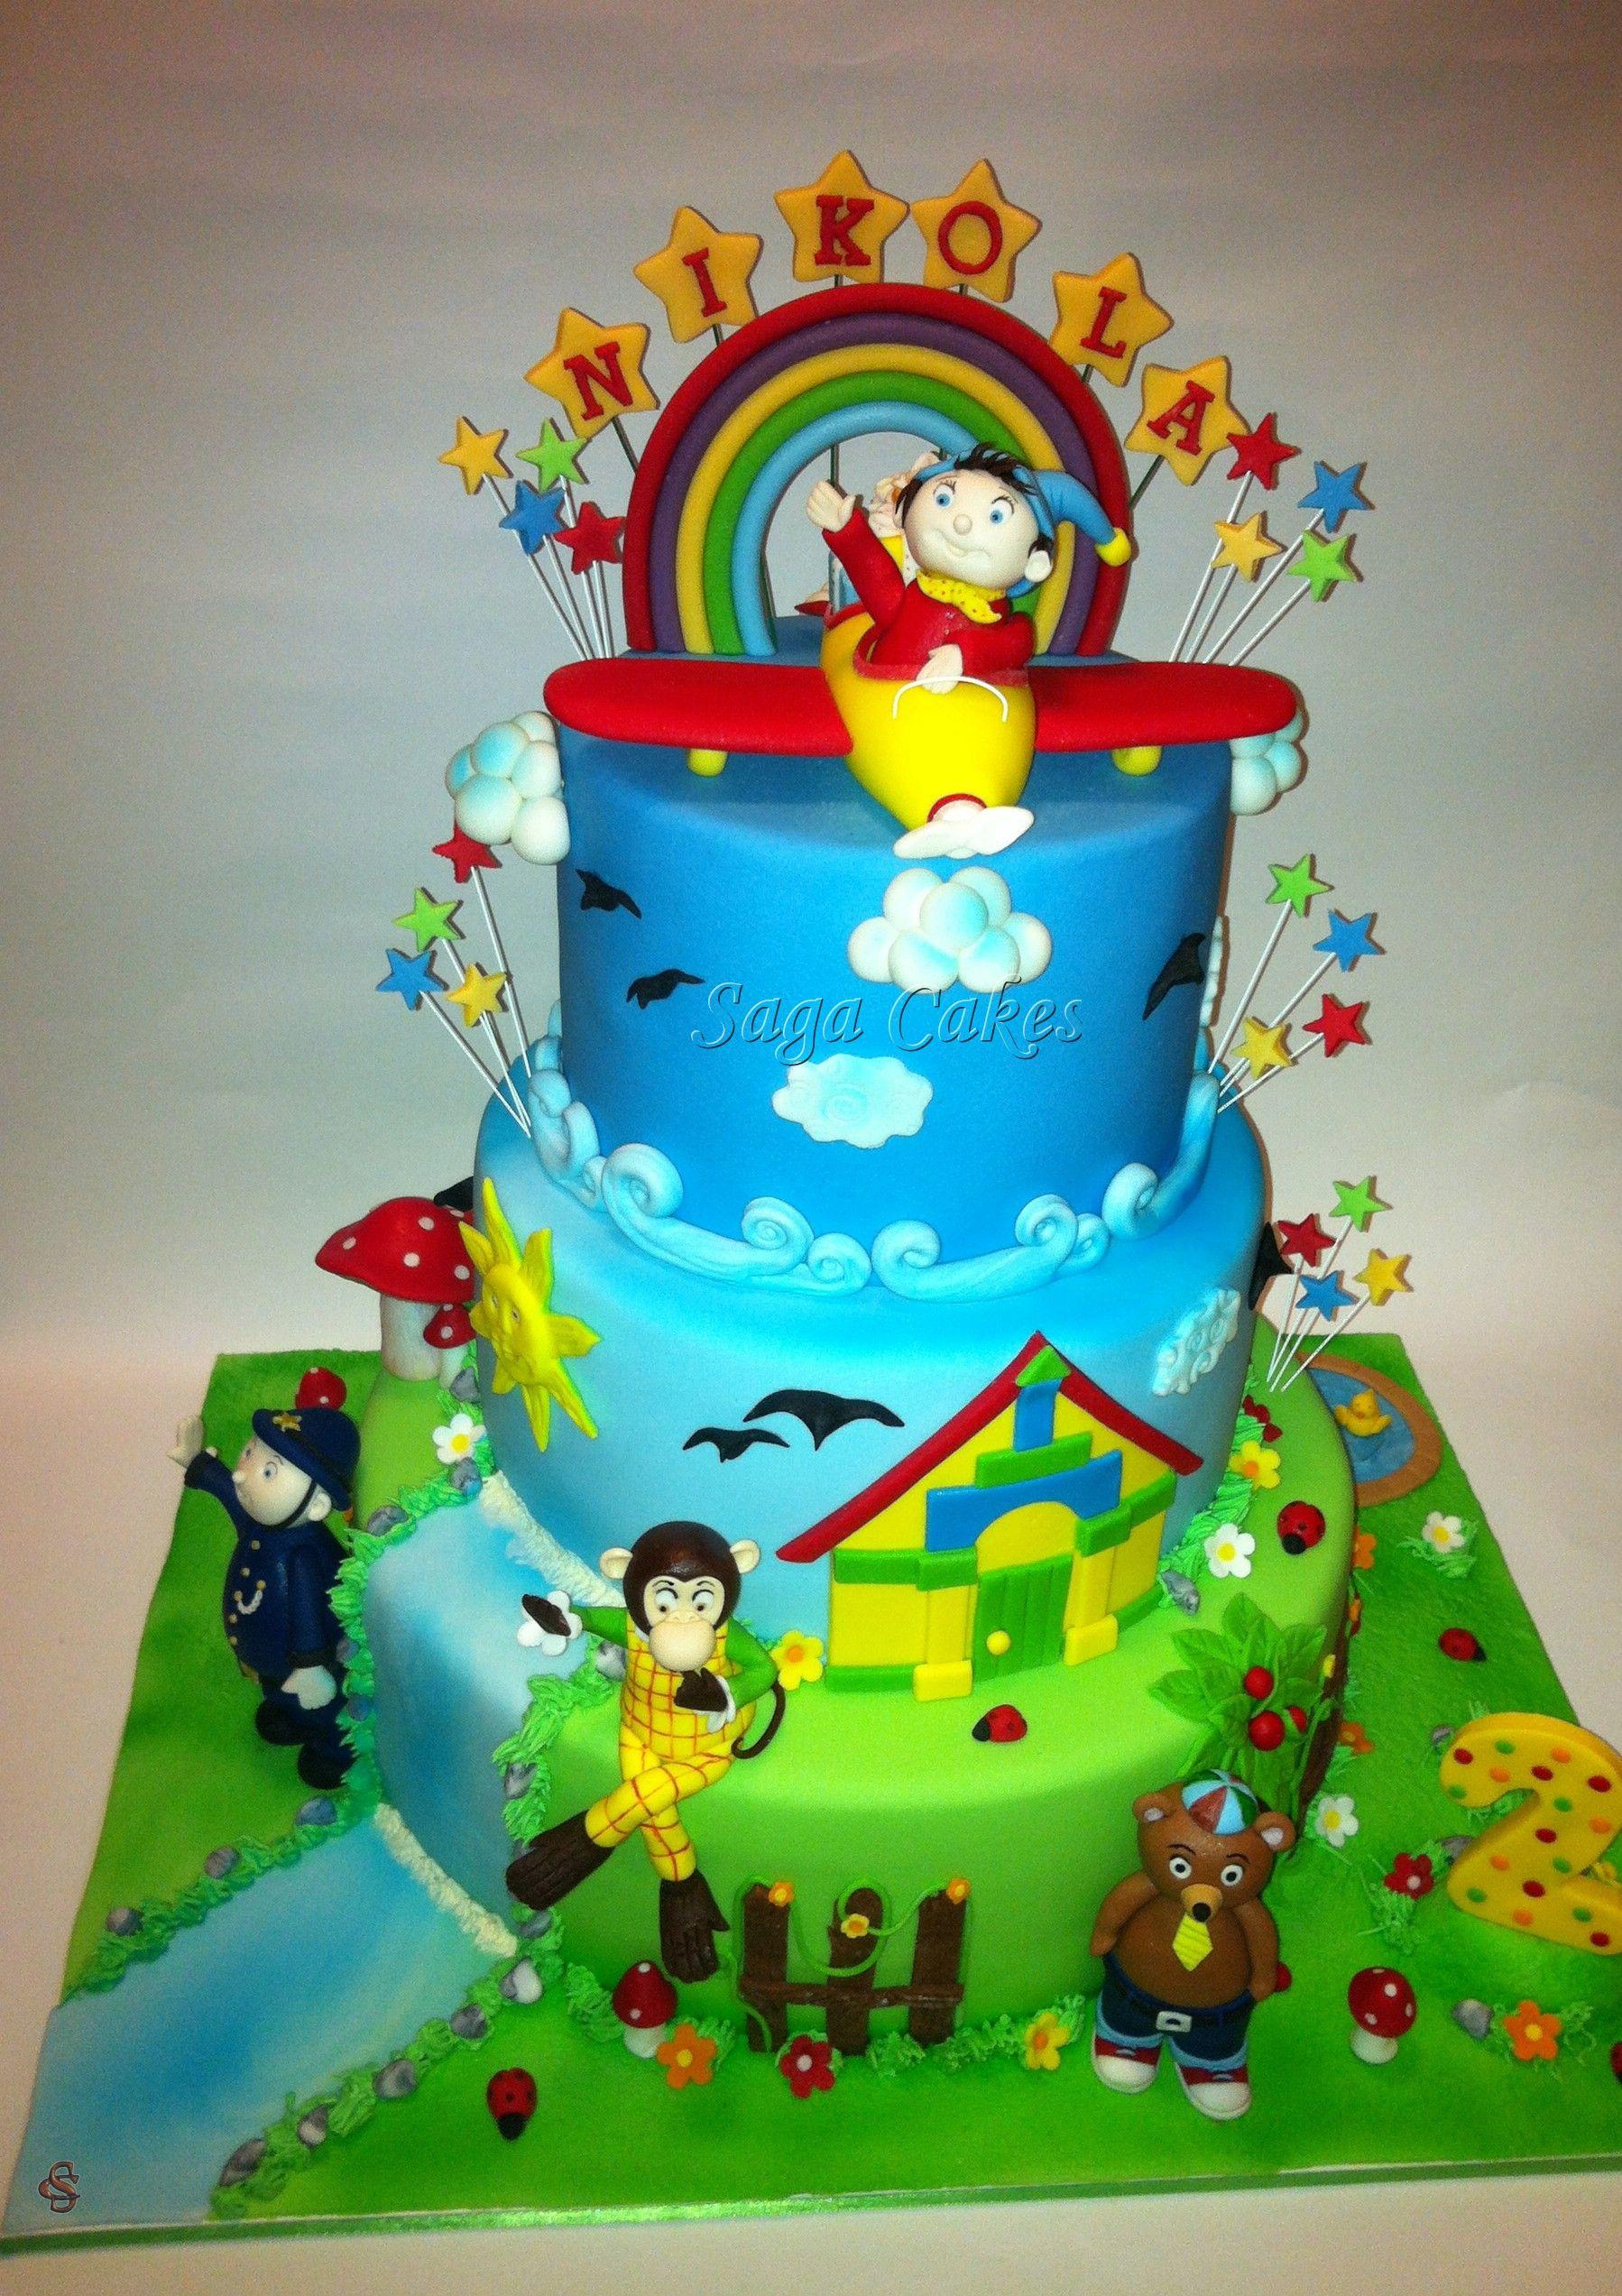 Noddy Https Www Facebook Com Saga Cakes Noddy Cake Amazing Cakes Cake Decorating